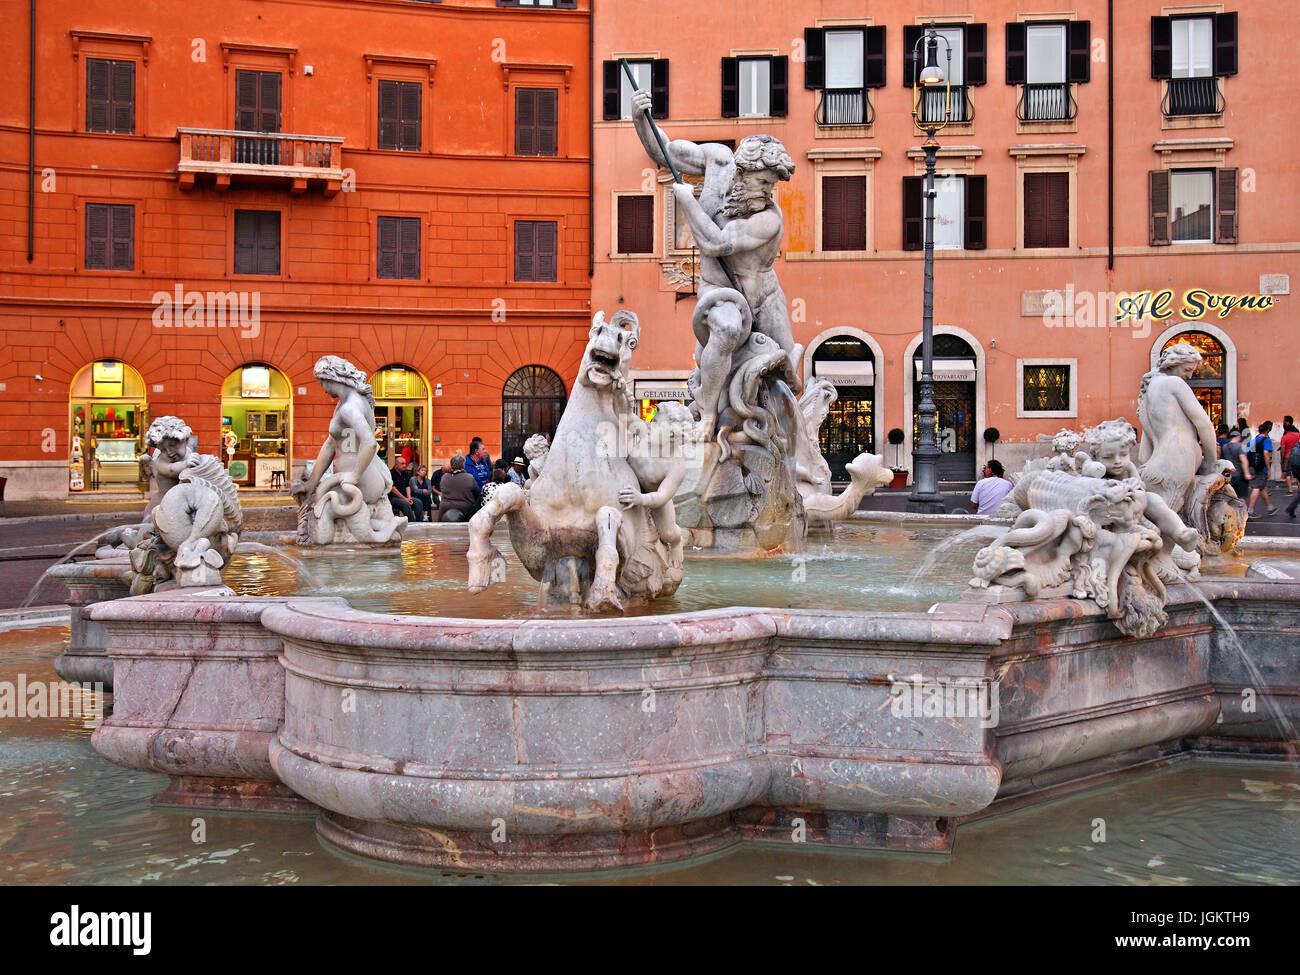 Fontana del Nettuno (Fountain of Neptune), Piazza Navona, Rome, Italy - Stock Image